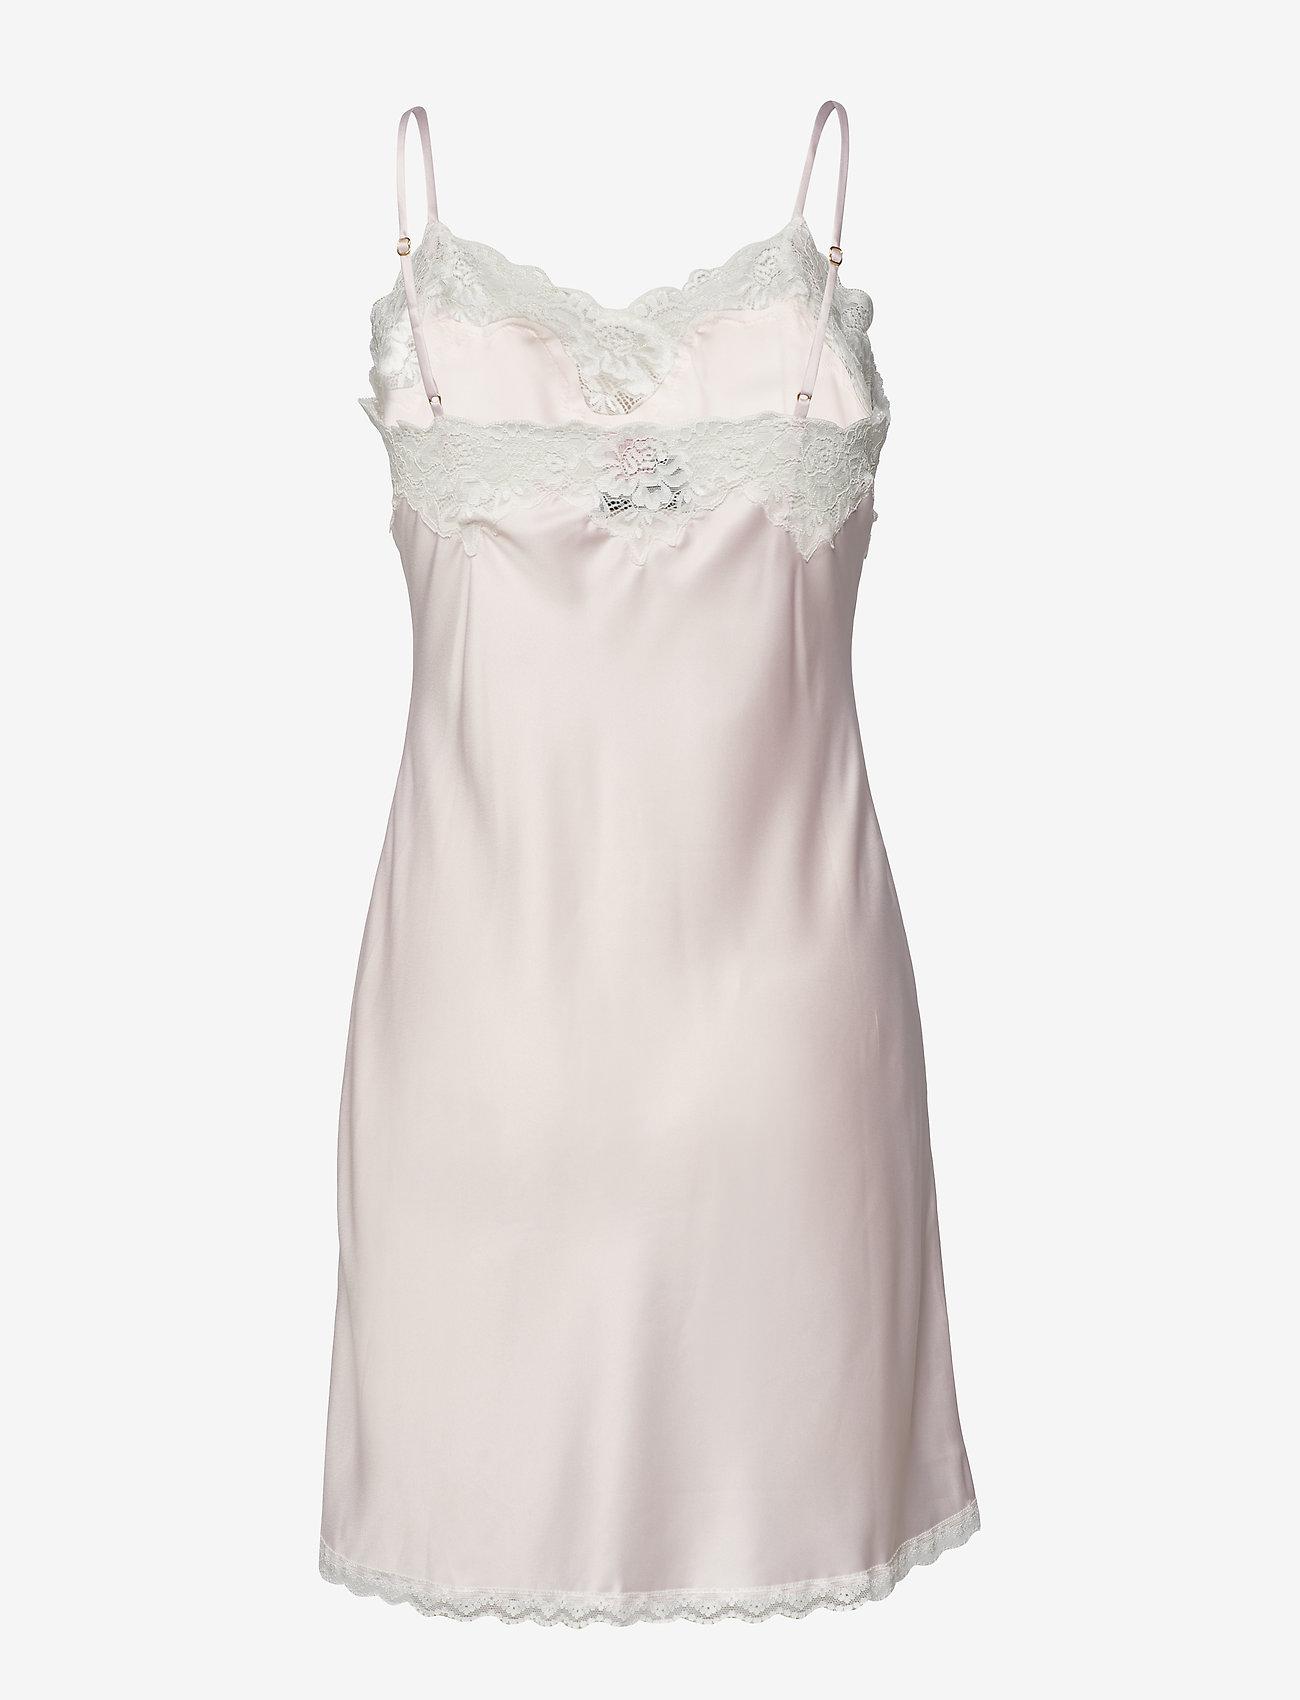 Lauren Ralph Lauren Homewear - LRL SIGNATURE LACE CHEMISE - bodies & slips - pink